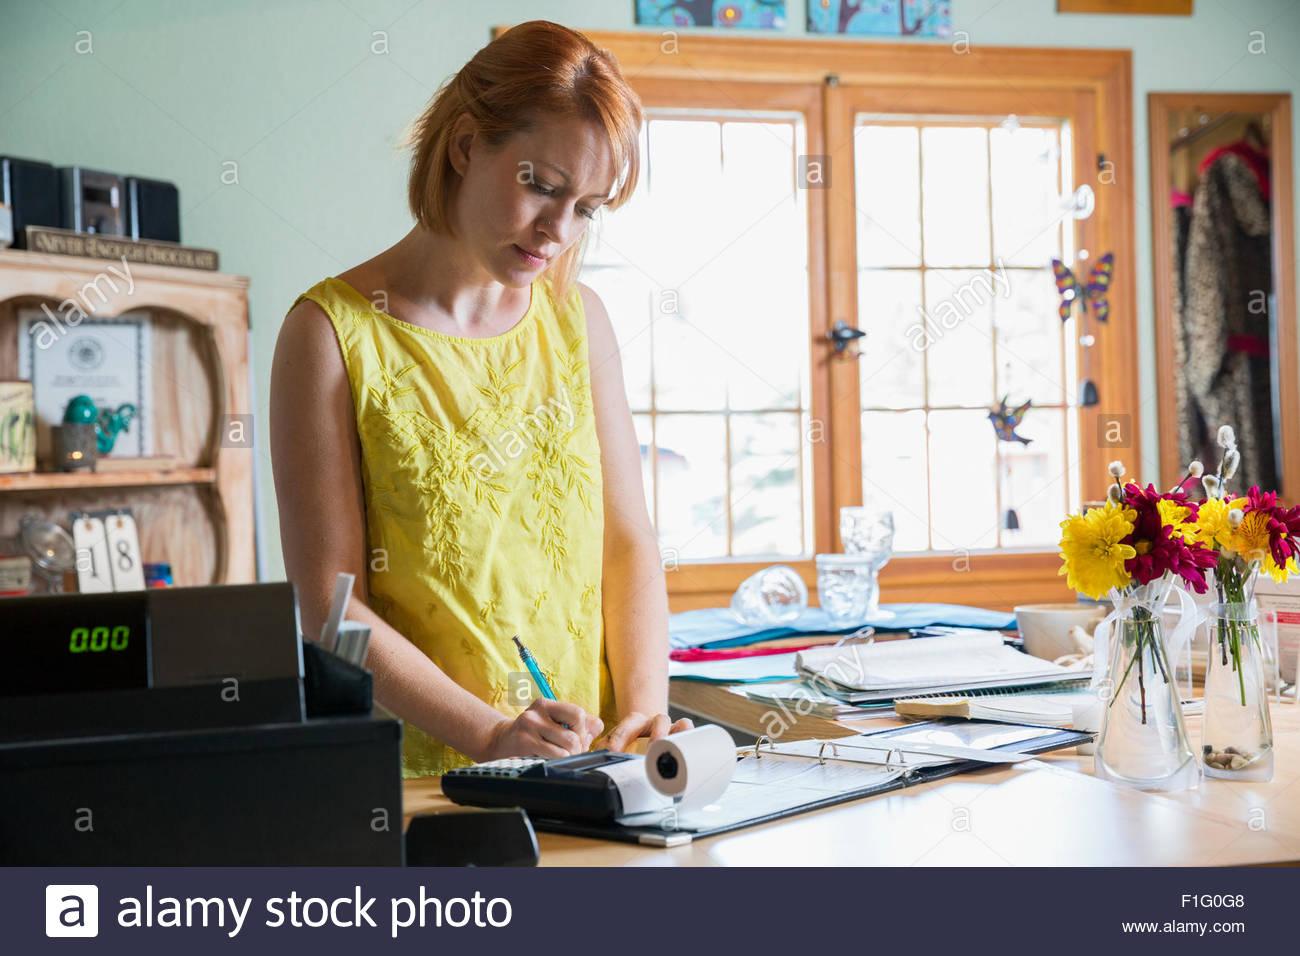 Shop owner paying bills at counter - Stock Image